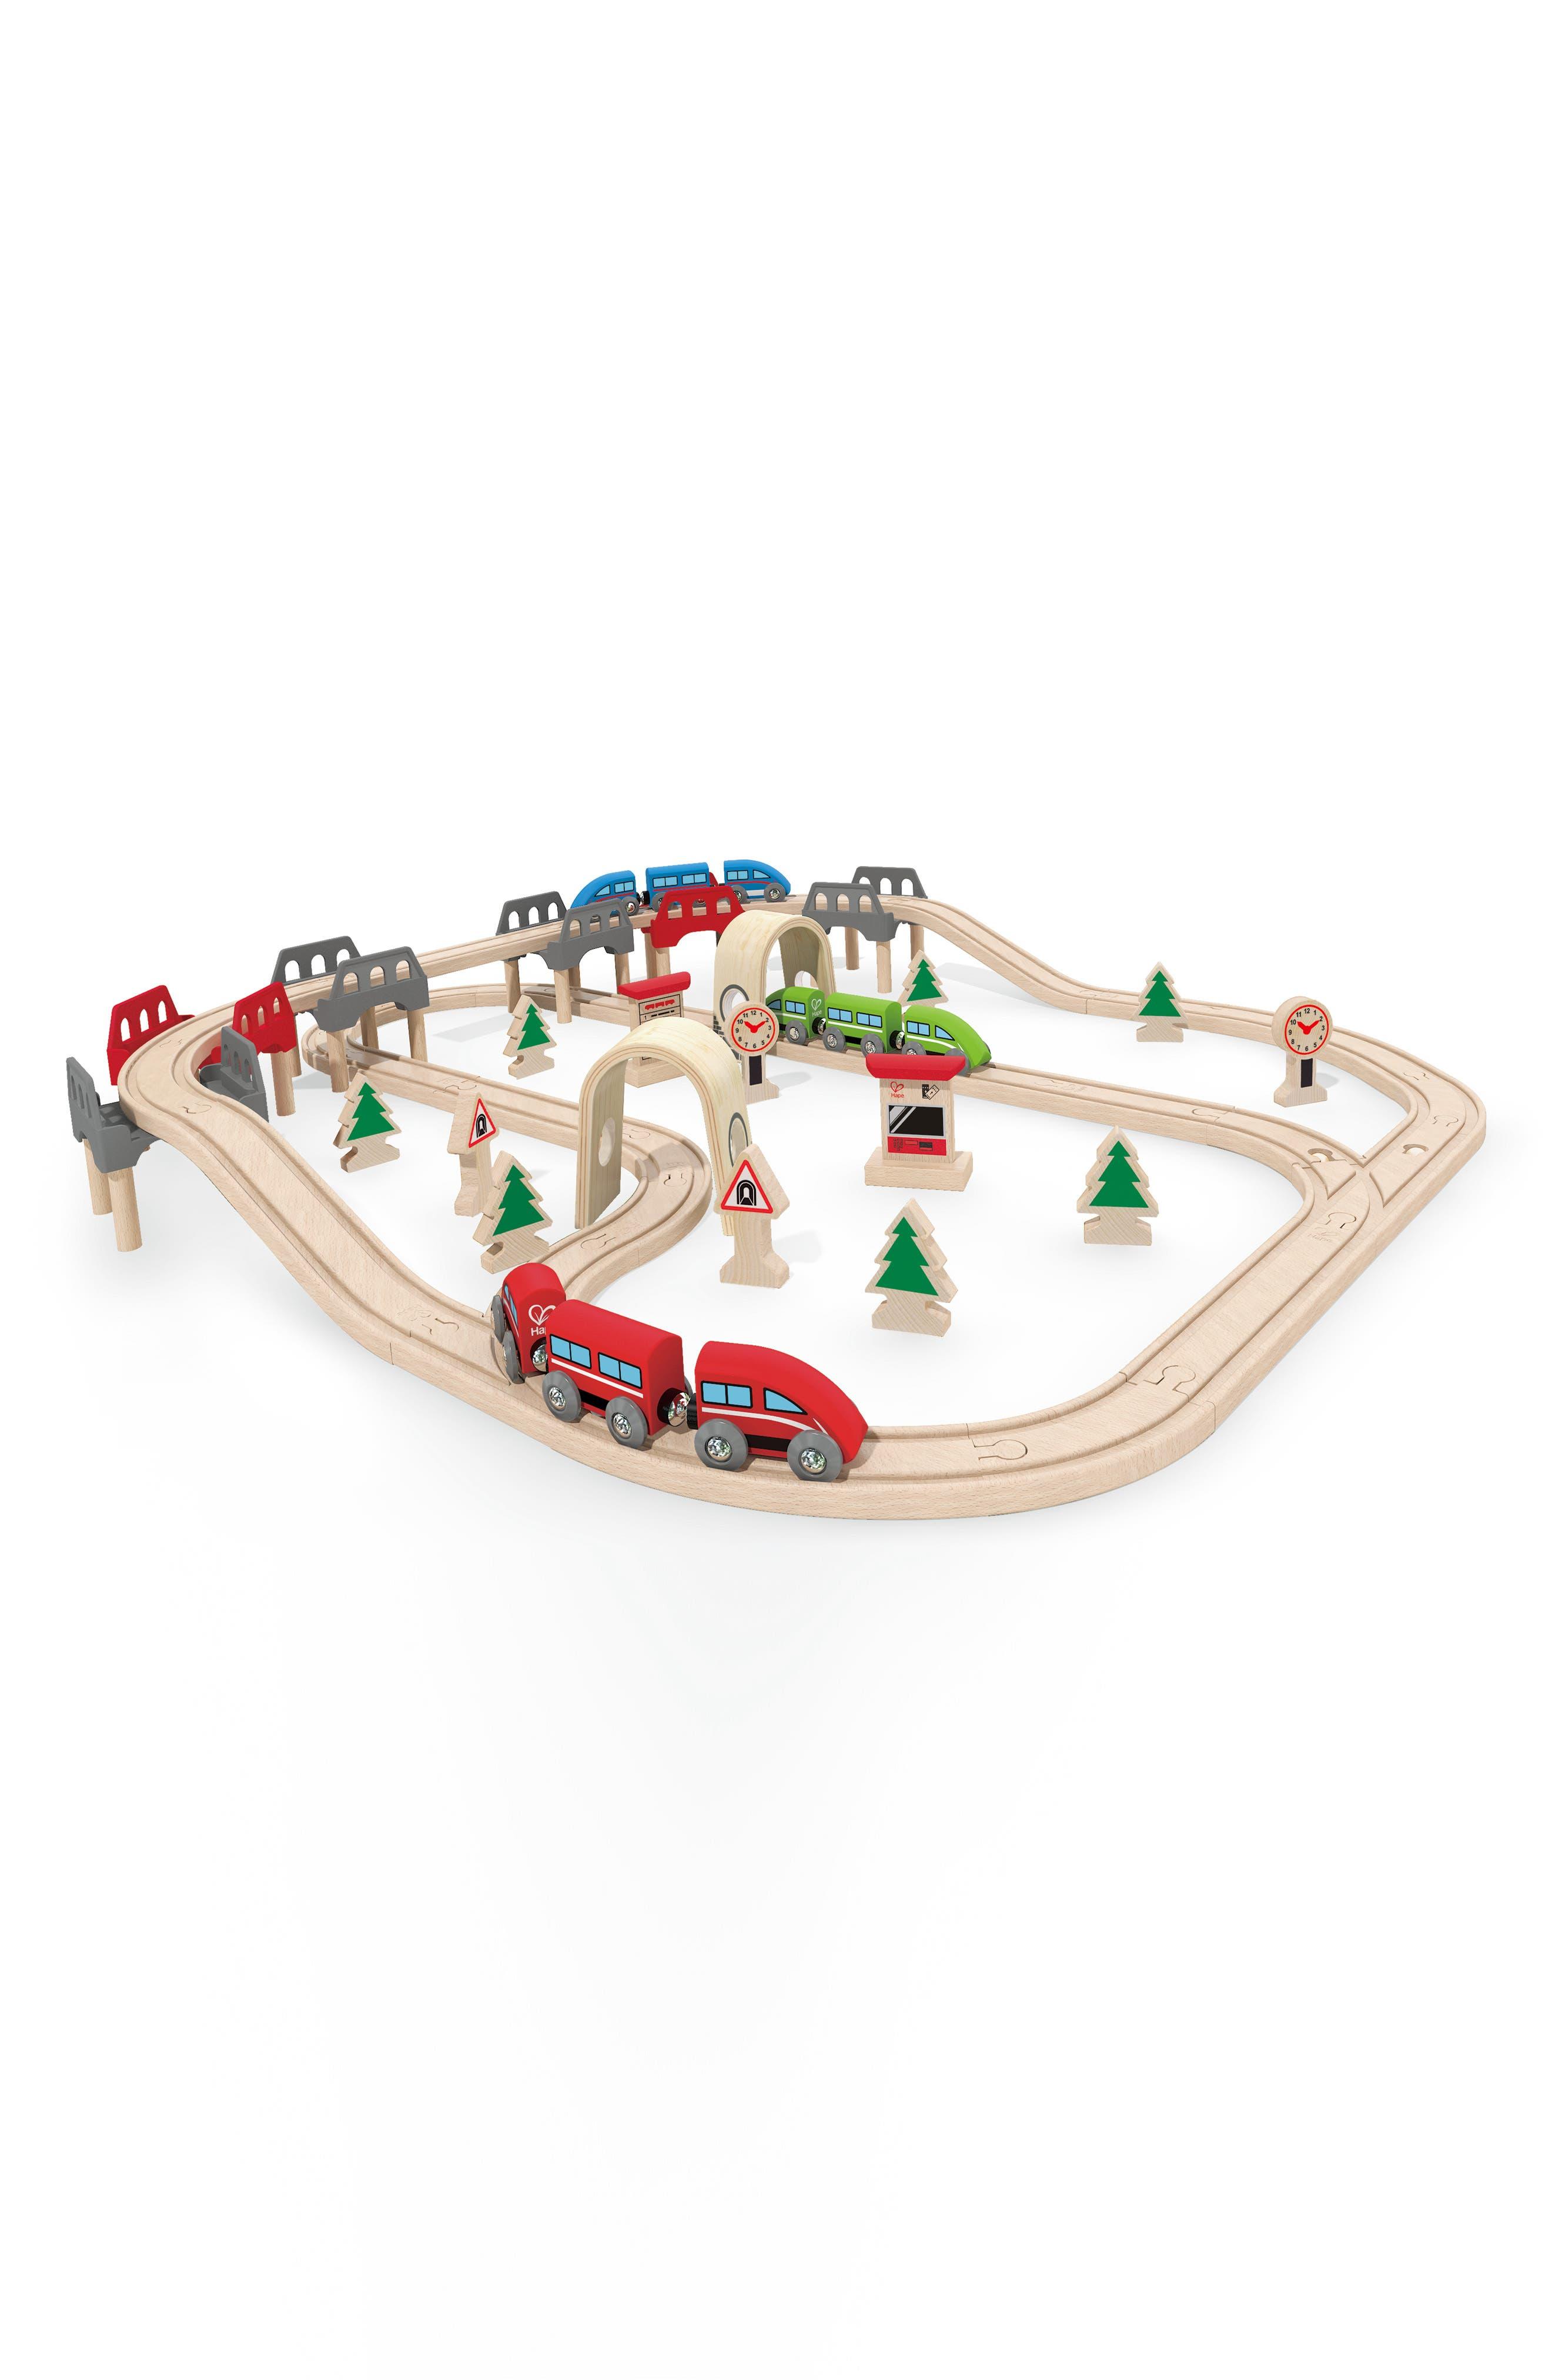 High & Low Railway Set,                         Main,                         color, 250